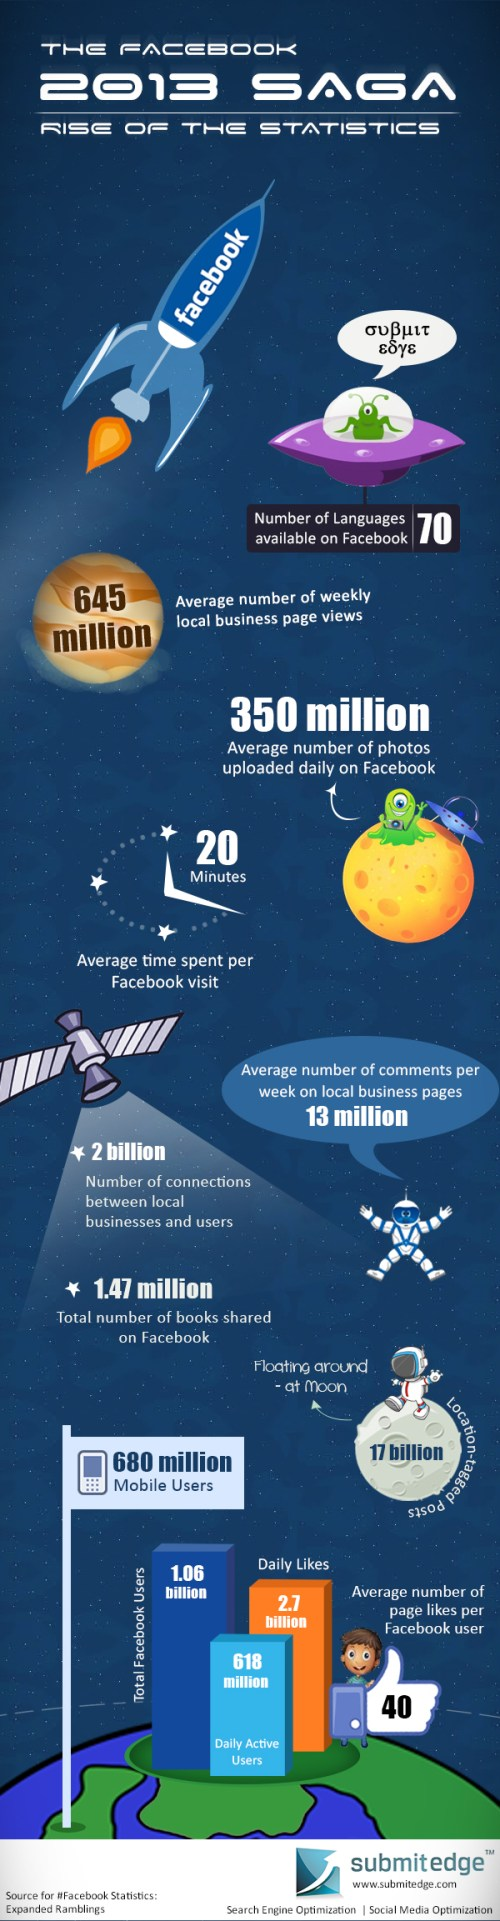 facebook-infographic_518245228de91